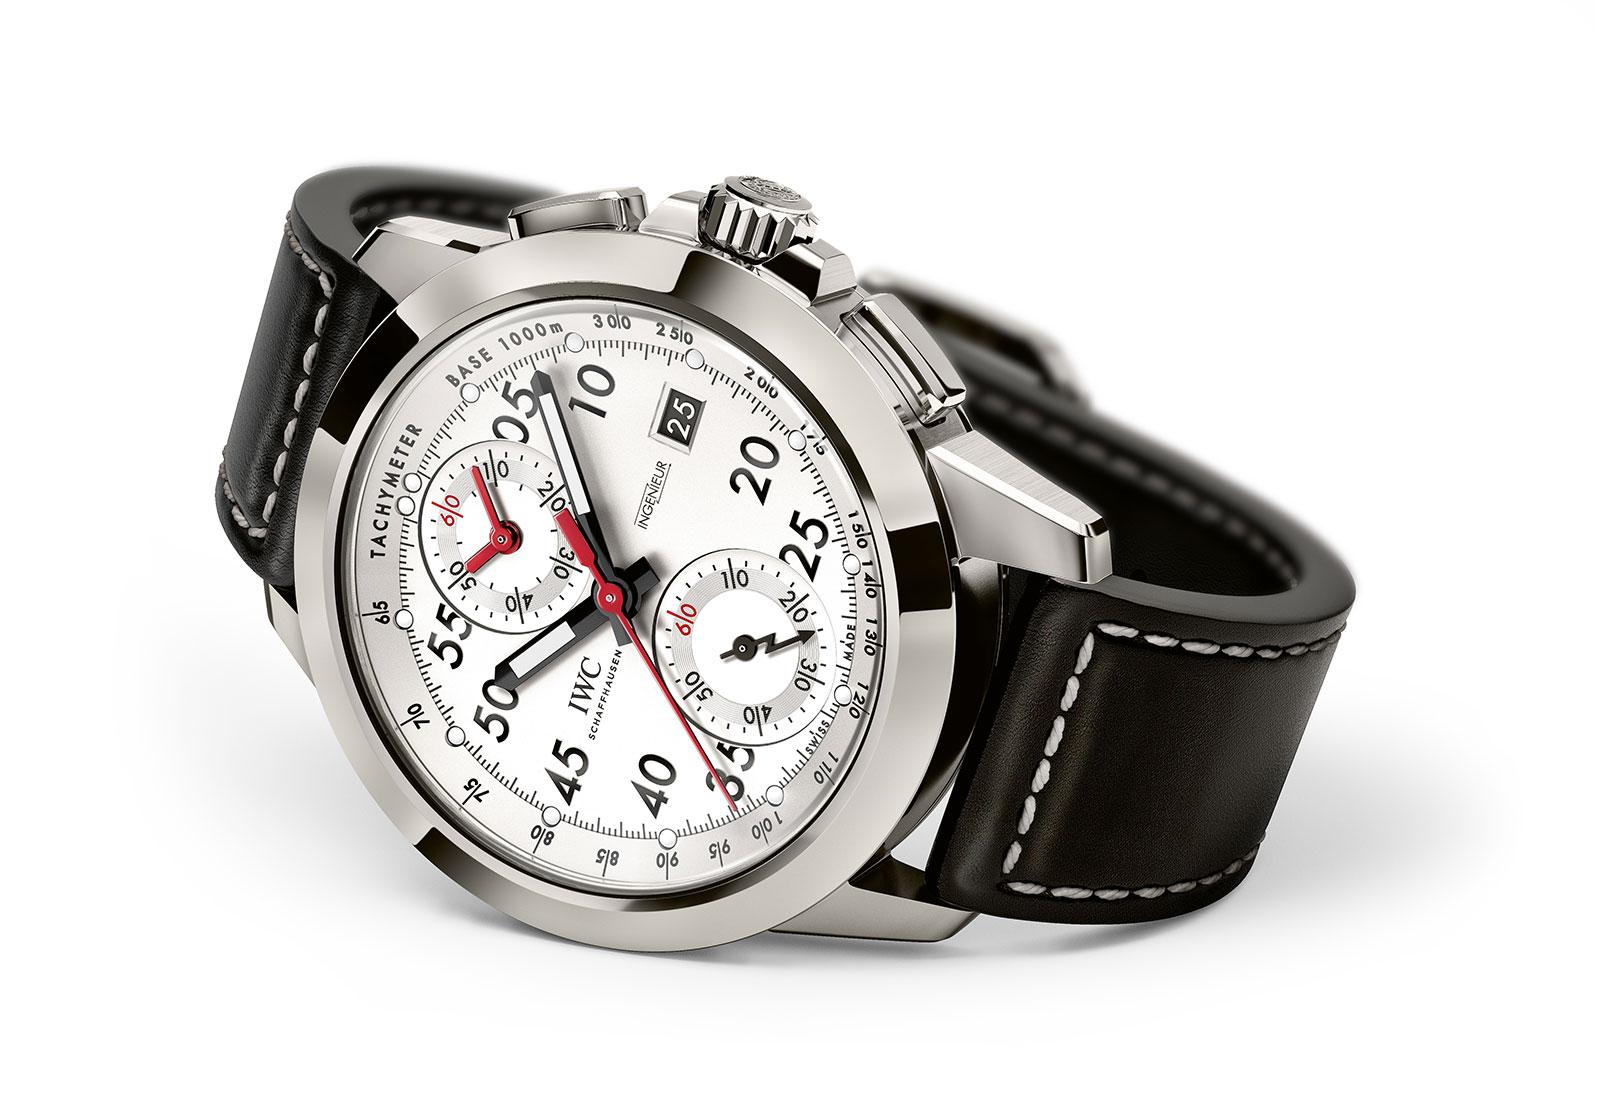 IWC Ingenieur Chronograph 50th Anniversary Mercedes-AMG 2